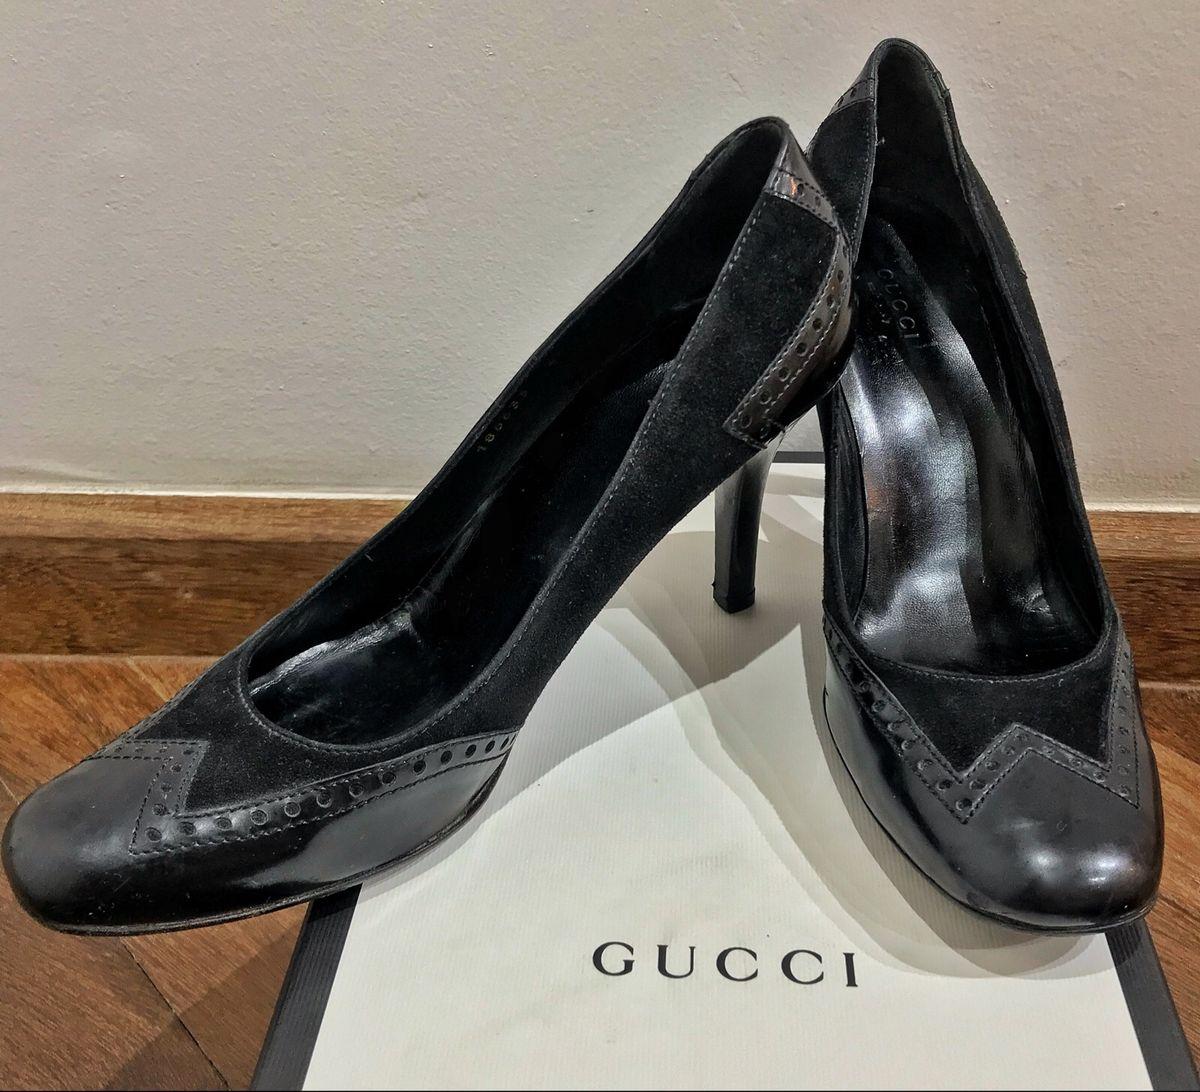 0ec44c3b1 salto gucci original - sapatos gucci.  Czm6ly9wag90b3muzw5qb2vplmnvbs5ici9wcm9kdwn0cy8xmdg4ndk0ms82m2q0y2viztkzyji1mtu2zdawmzuwzde5mmyzodrkoc5qcgc